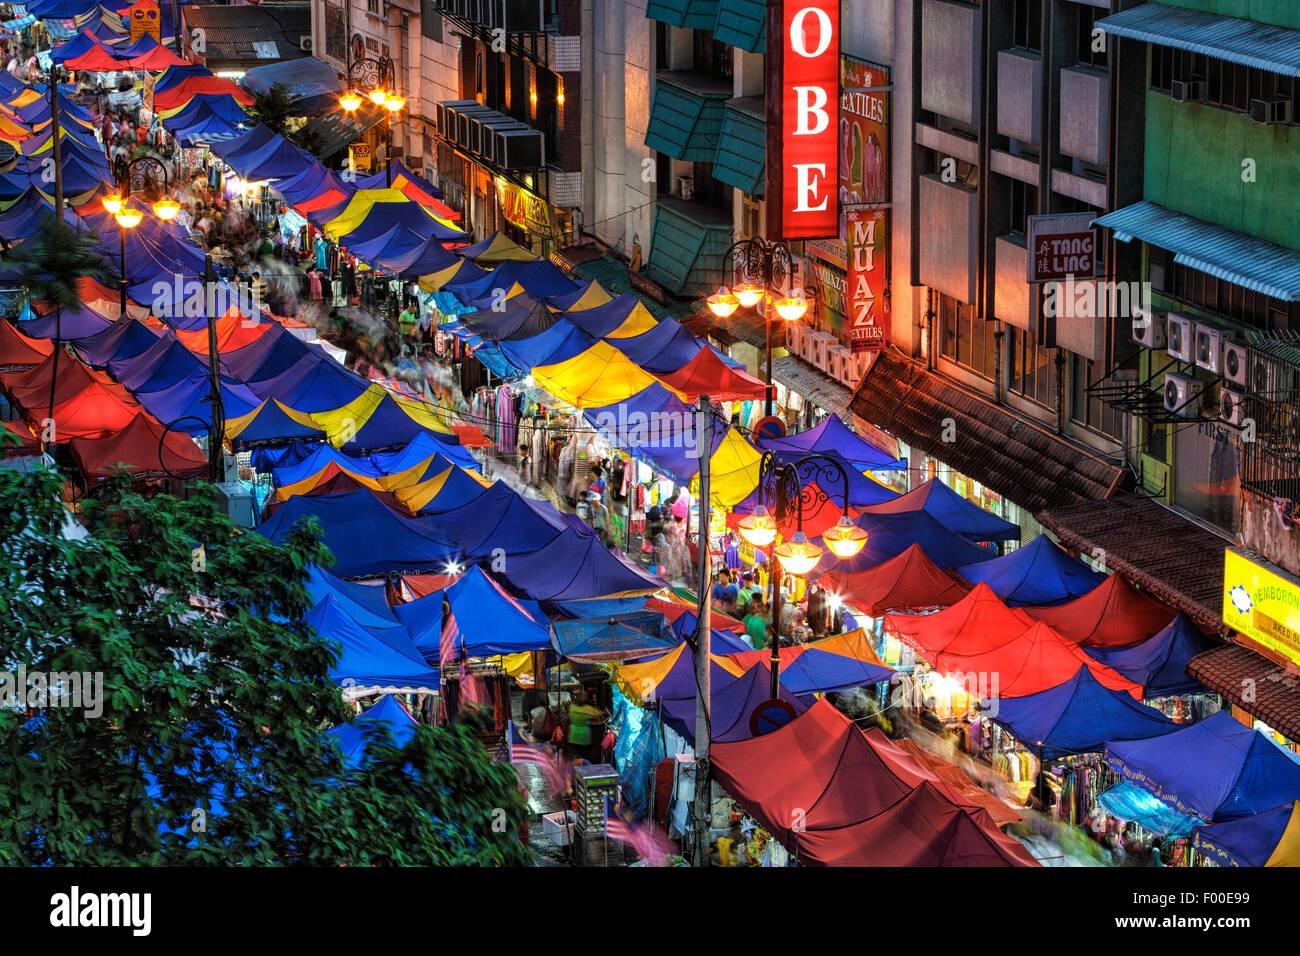 Le marché de nuit de Kuala Lumpur pendant le mois de Ramadan. Photo Stock